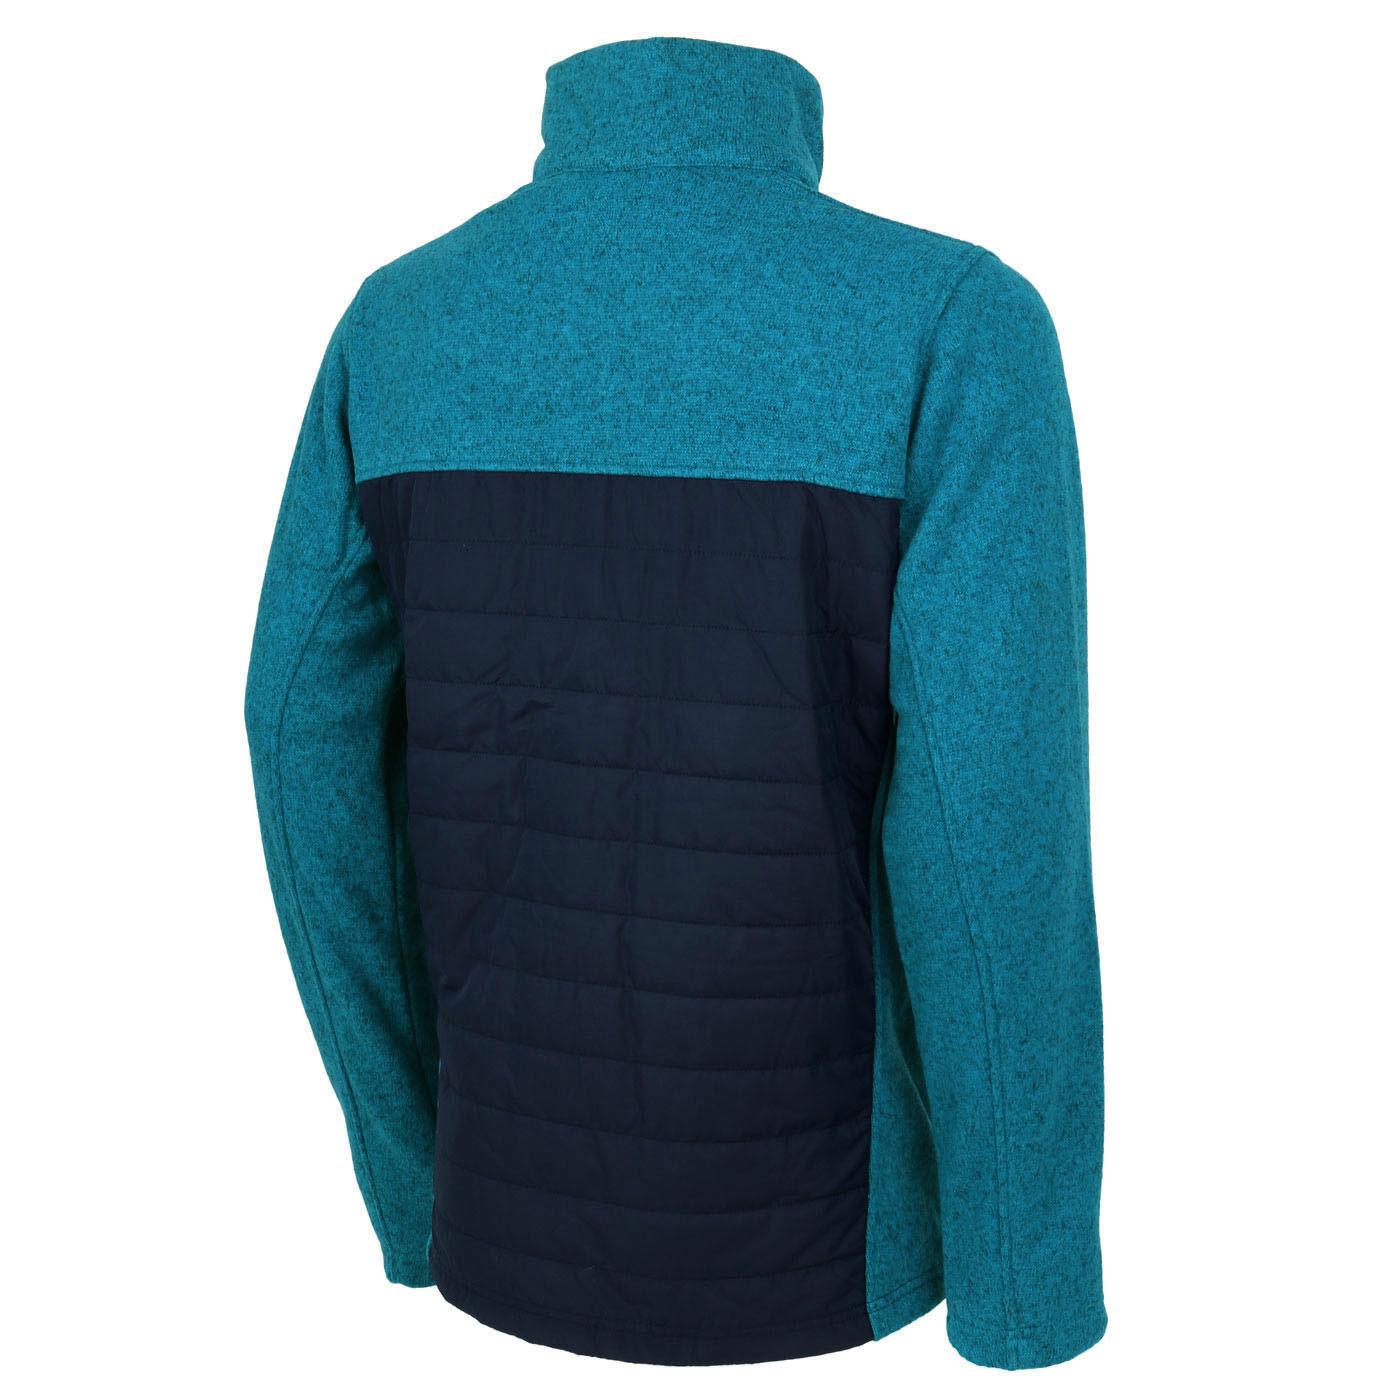 Image of Vaude SE Vajont Fleece Jacket - atlantic